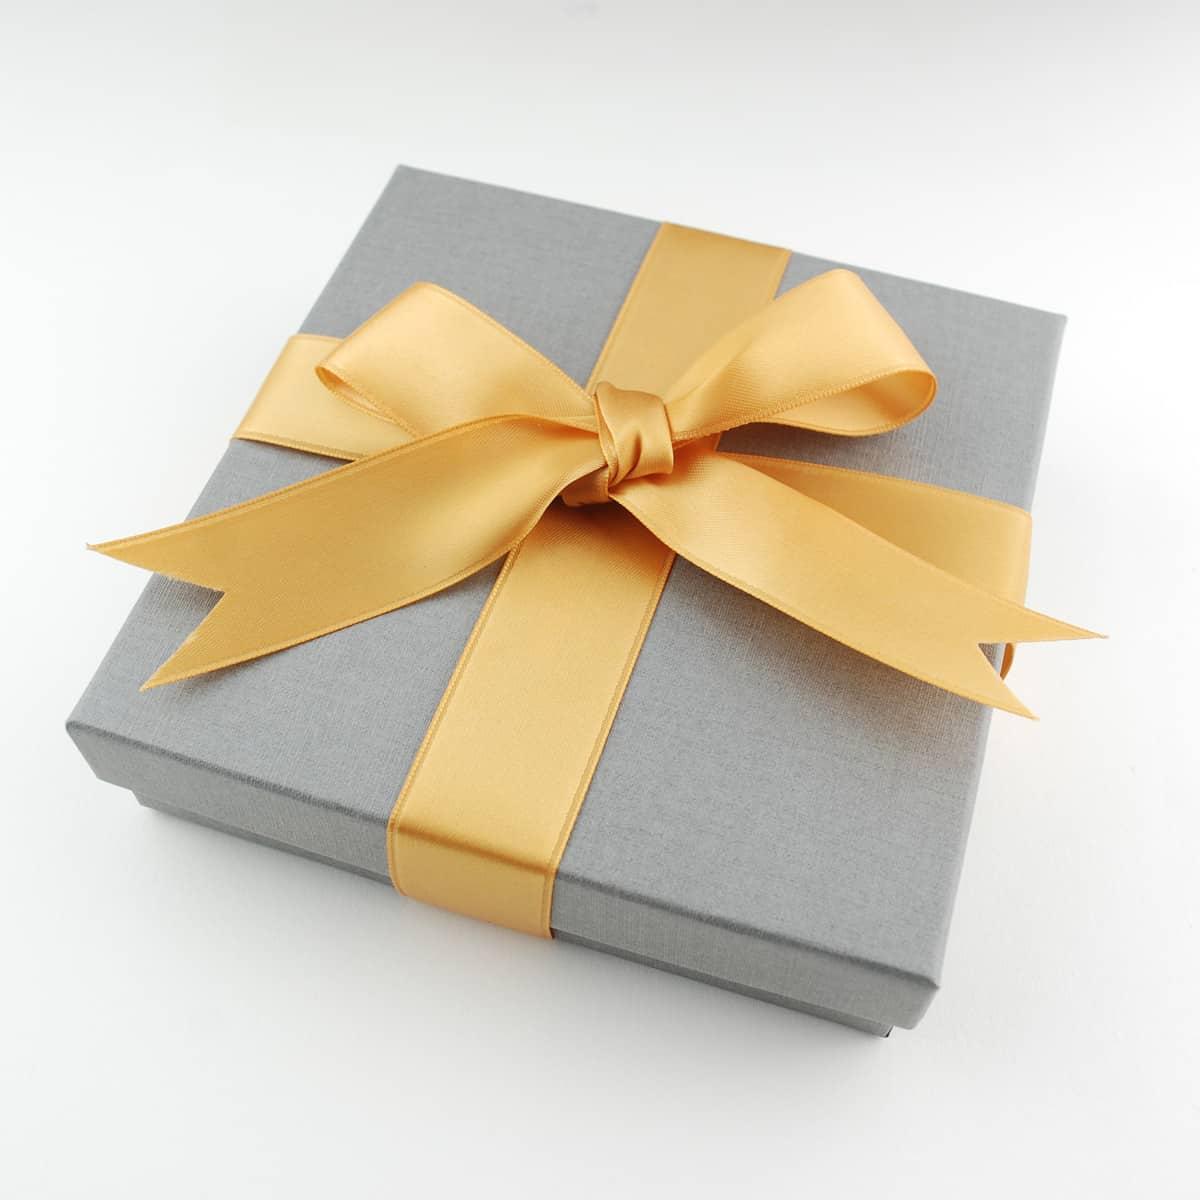 Personalised Jewellery Gift Box